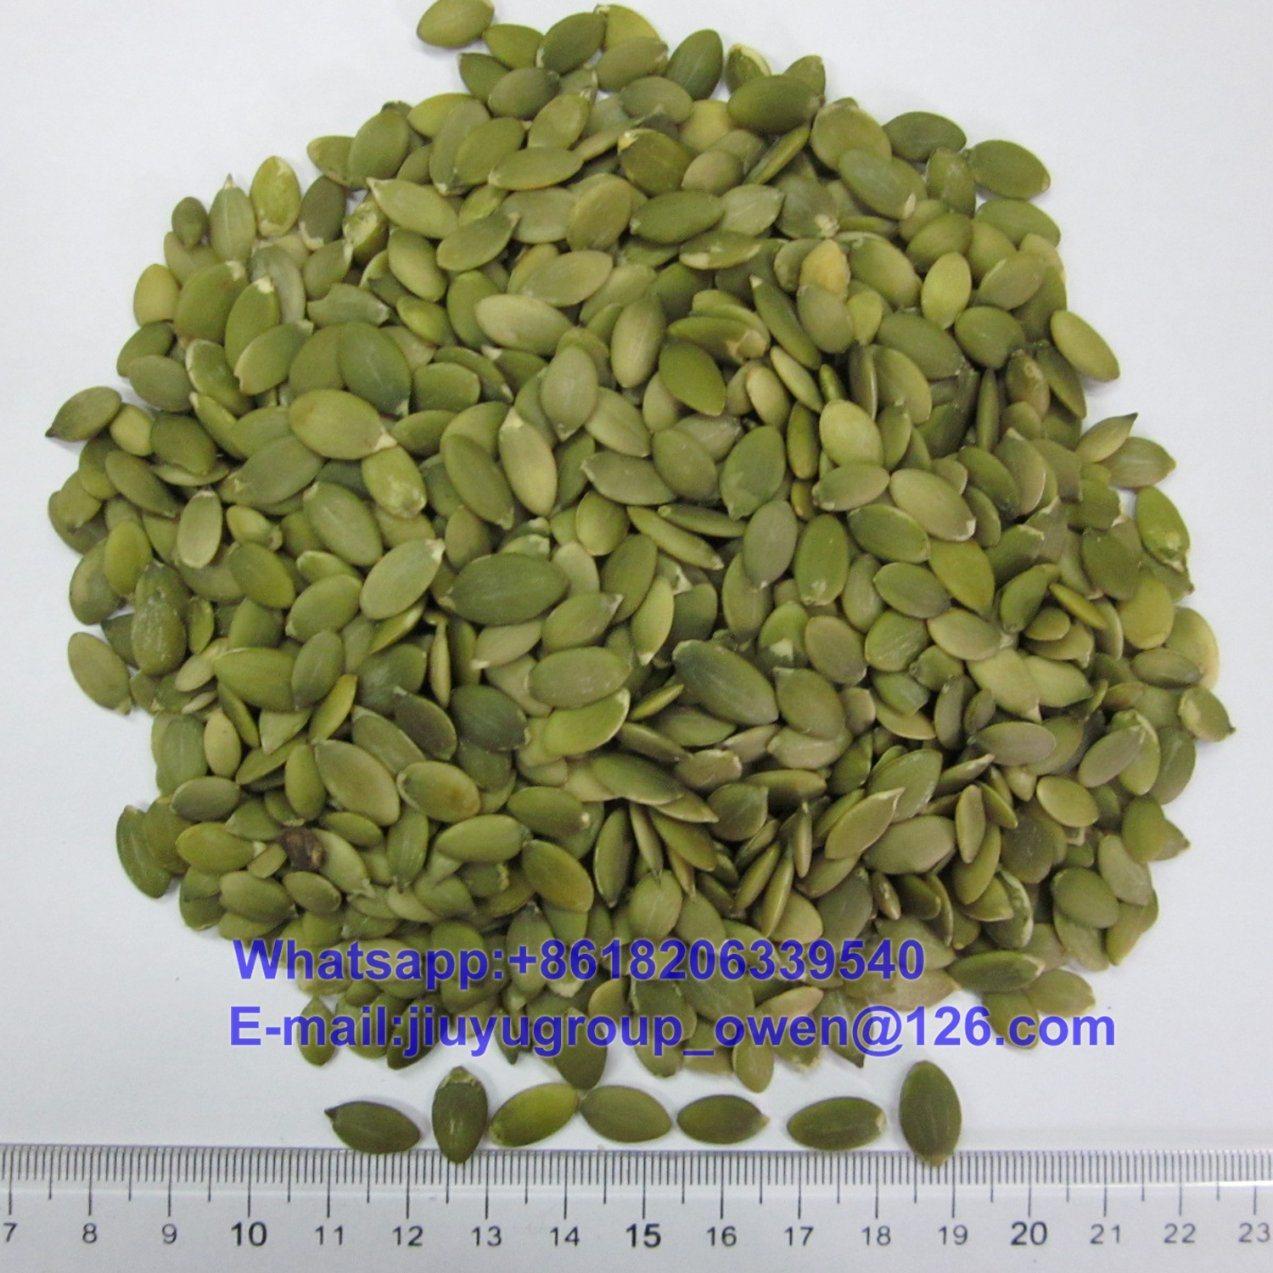 HPS Top Quality Shine Skin Pumpkin Seeds